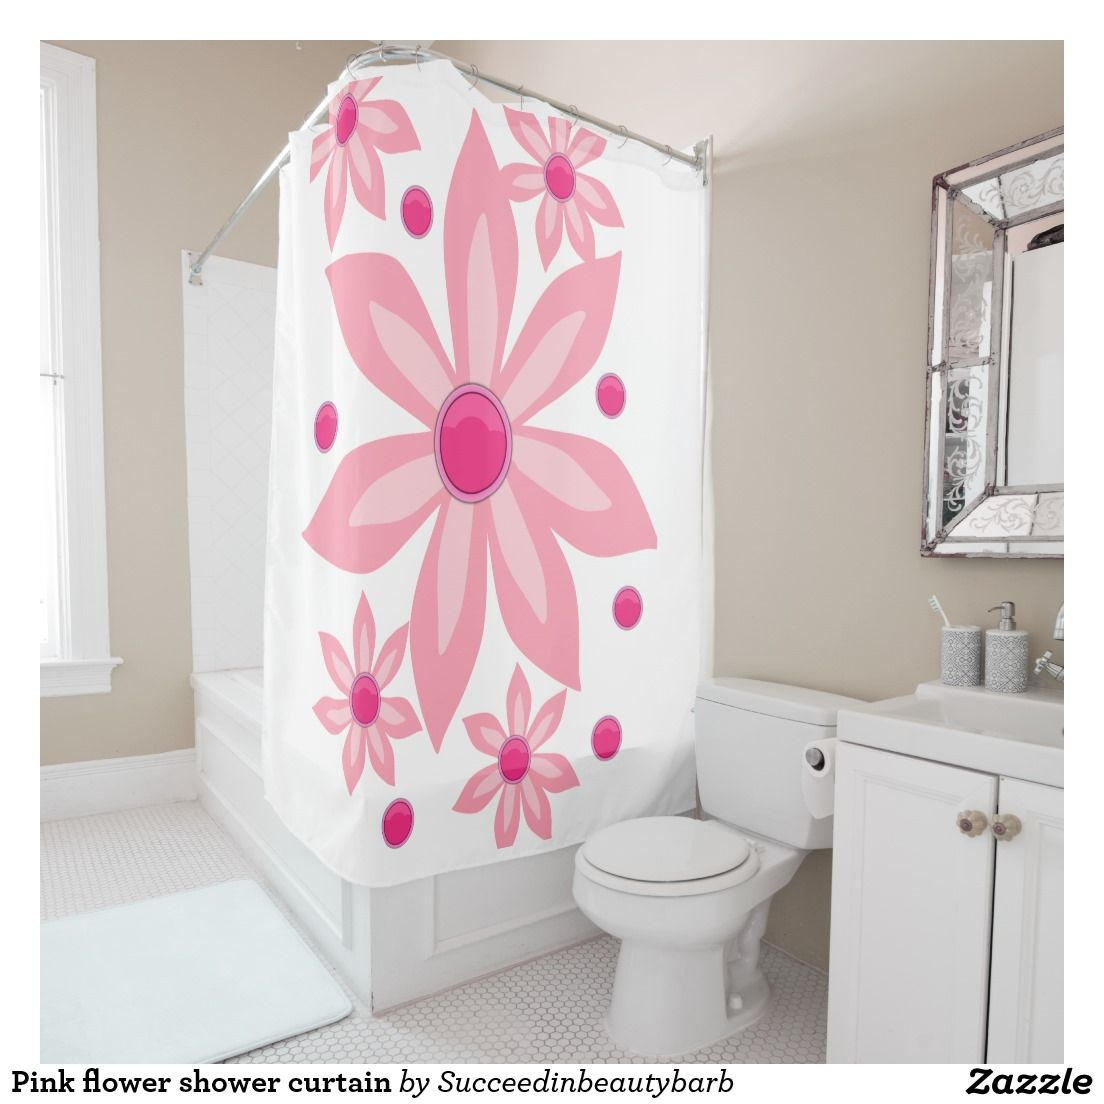 Pink flower shower curtain shower curtains pinterest flower shower pink flower shower curtain mightylinksfo